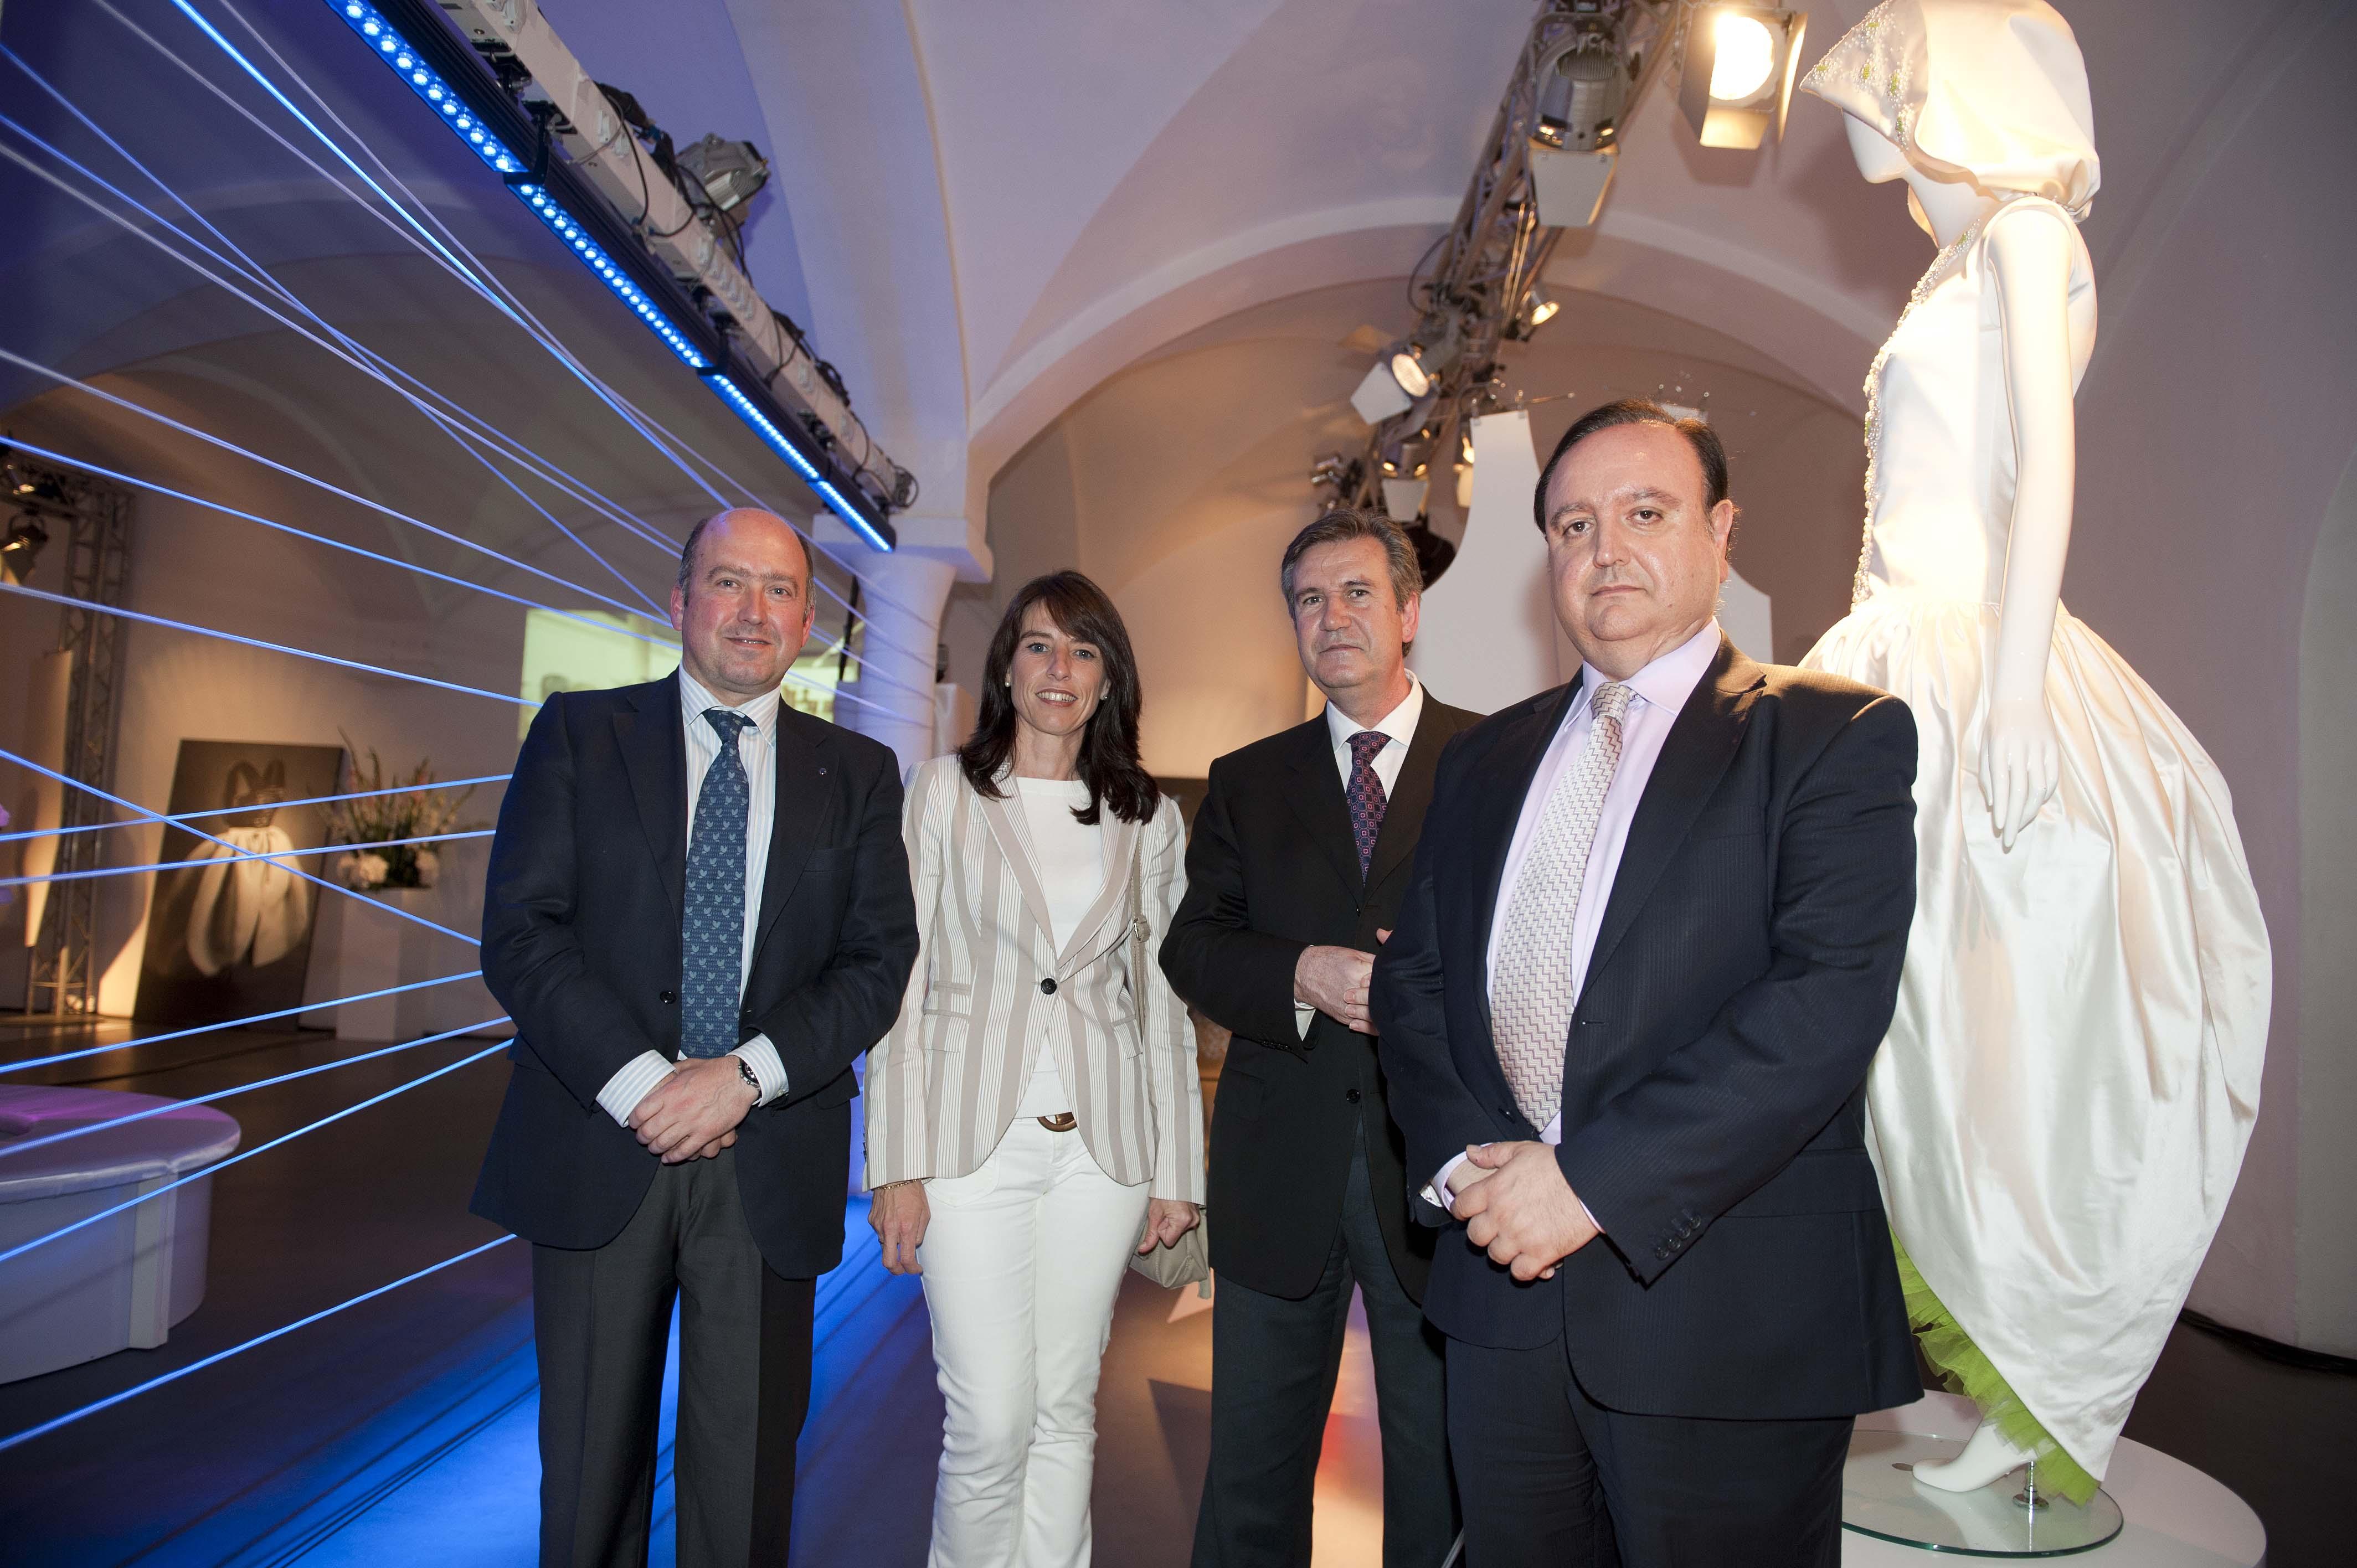 2011_06_07_munich_turismo_unda_parlamentarios.jpg